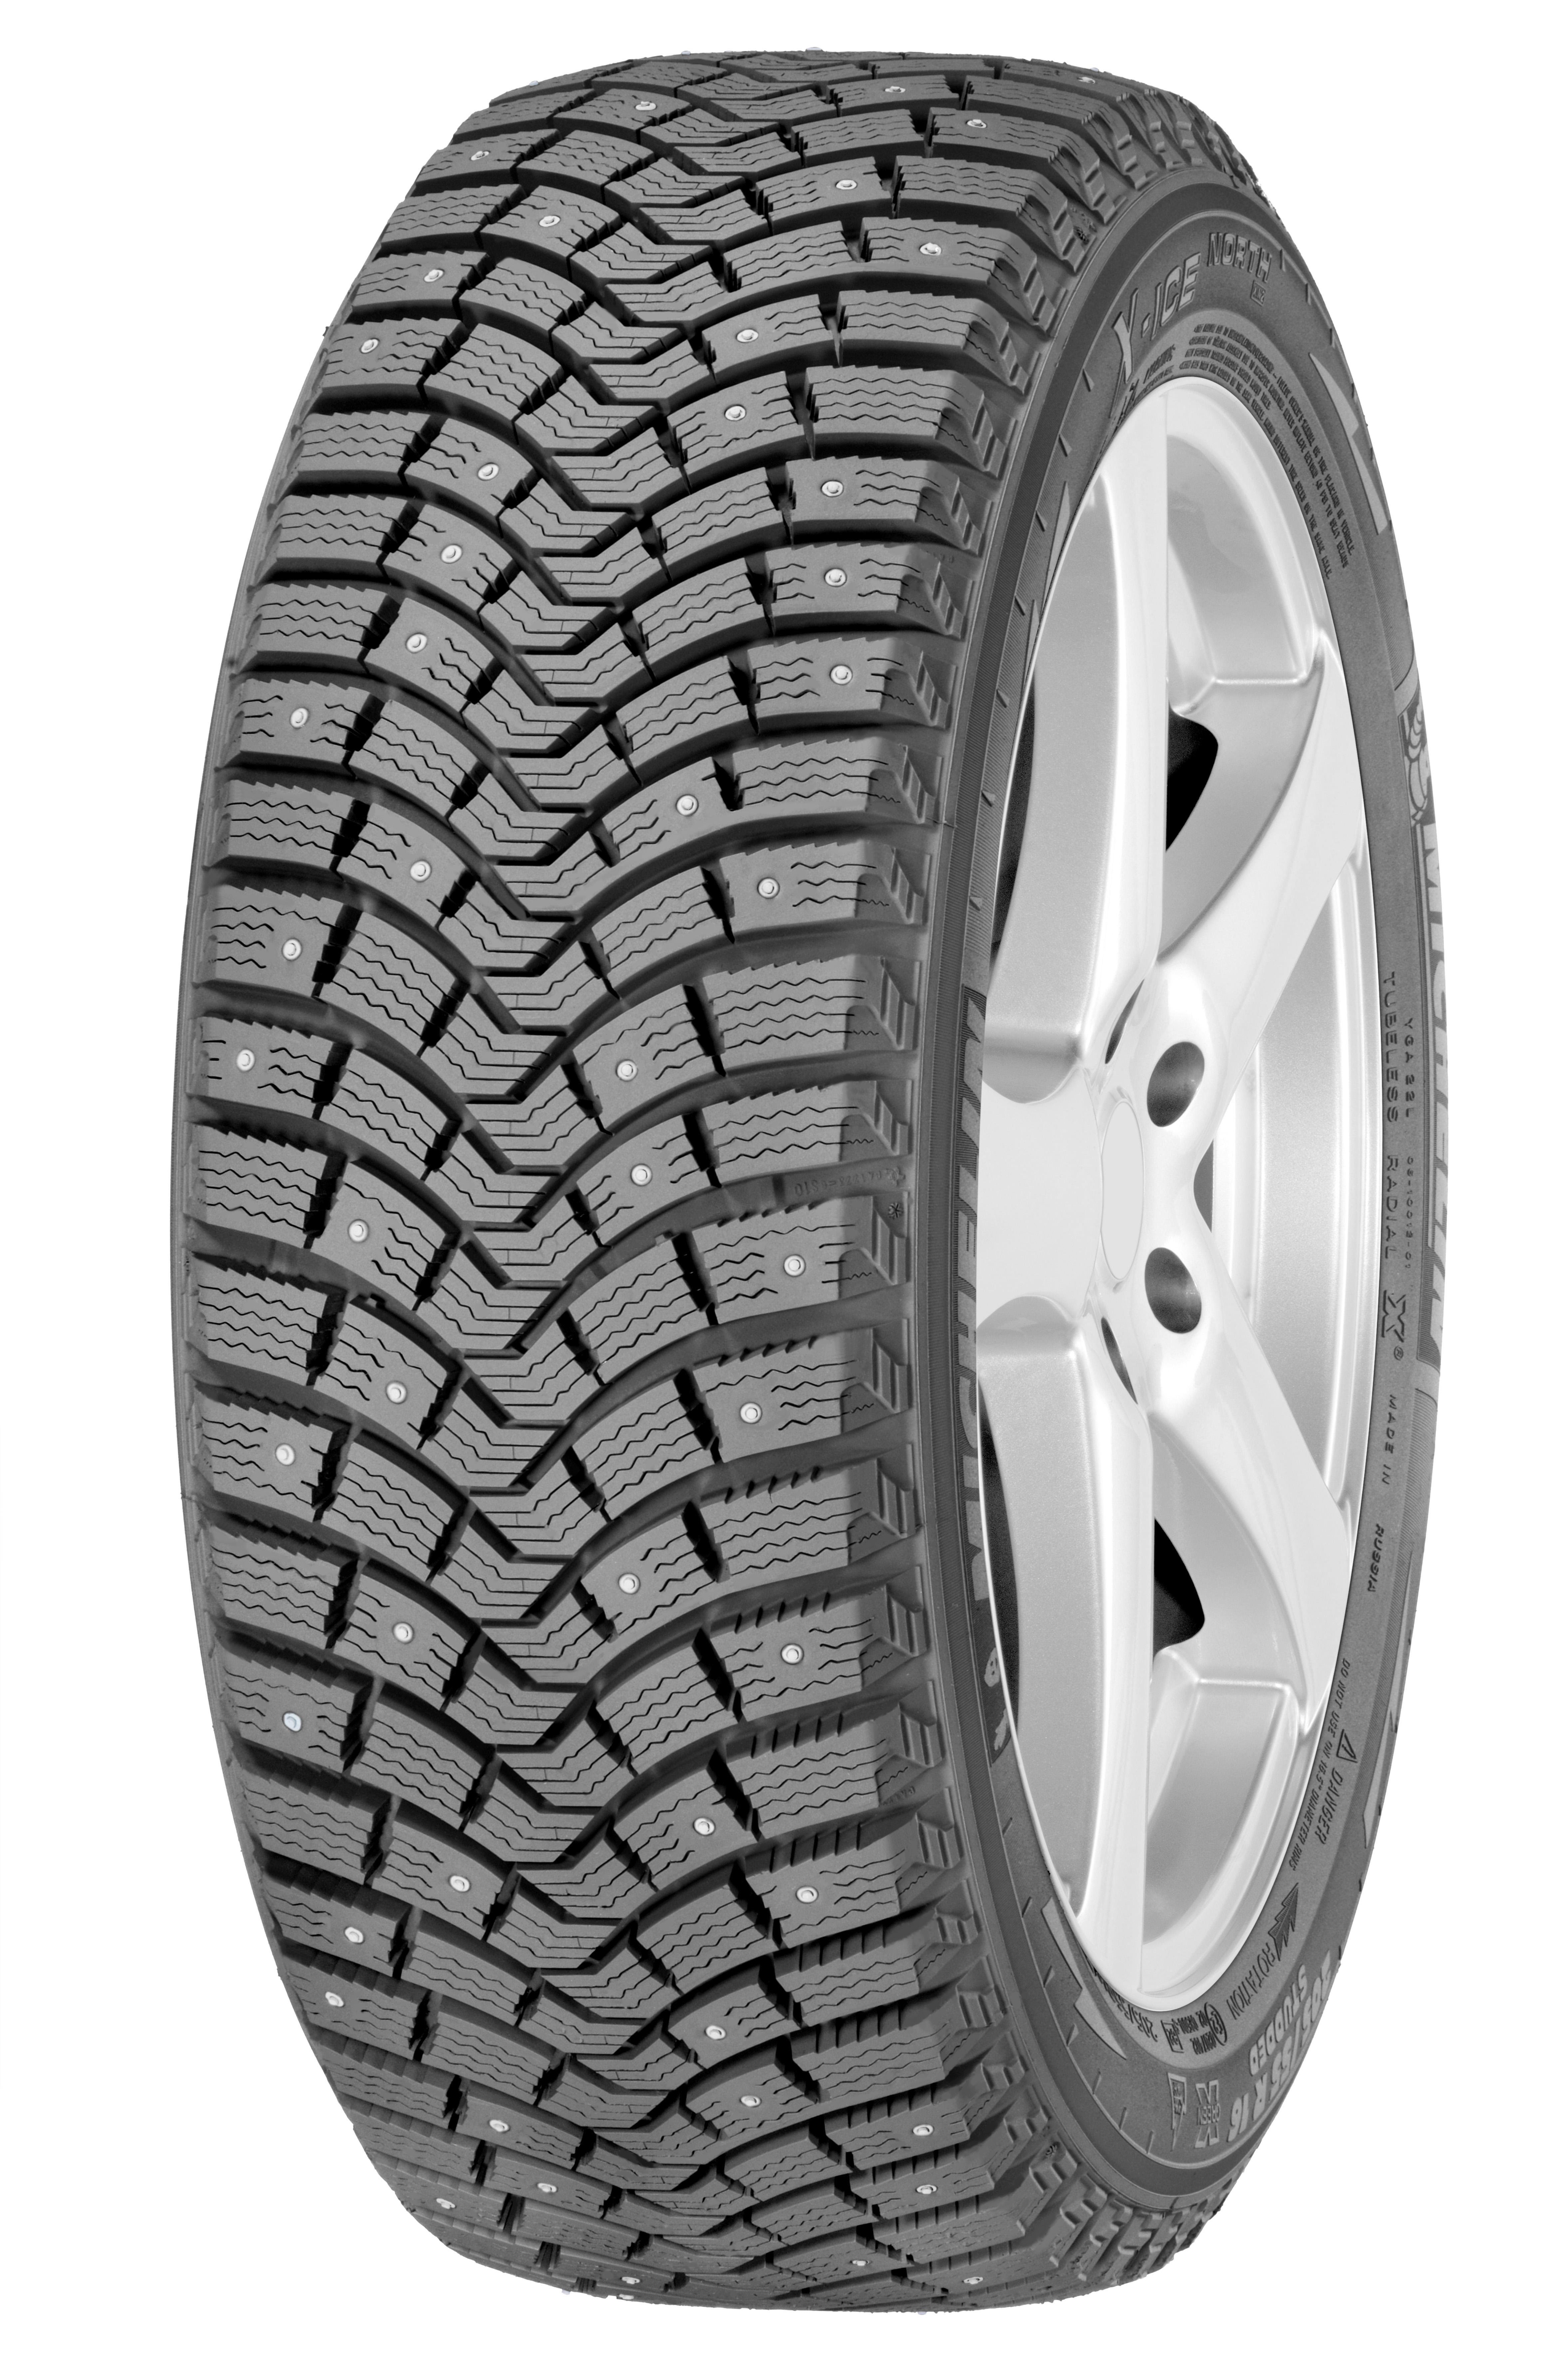 автомобильные шины Michelin Latitude X-Ice North 2+ 305/35 R21 109T